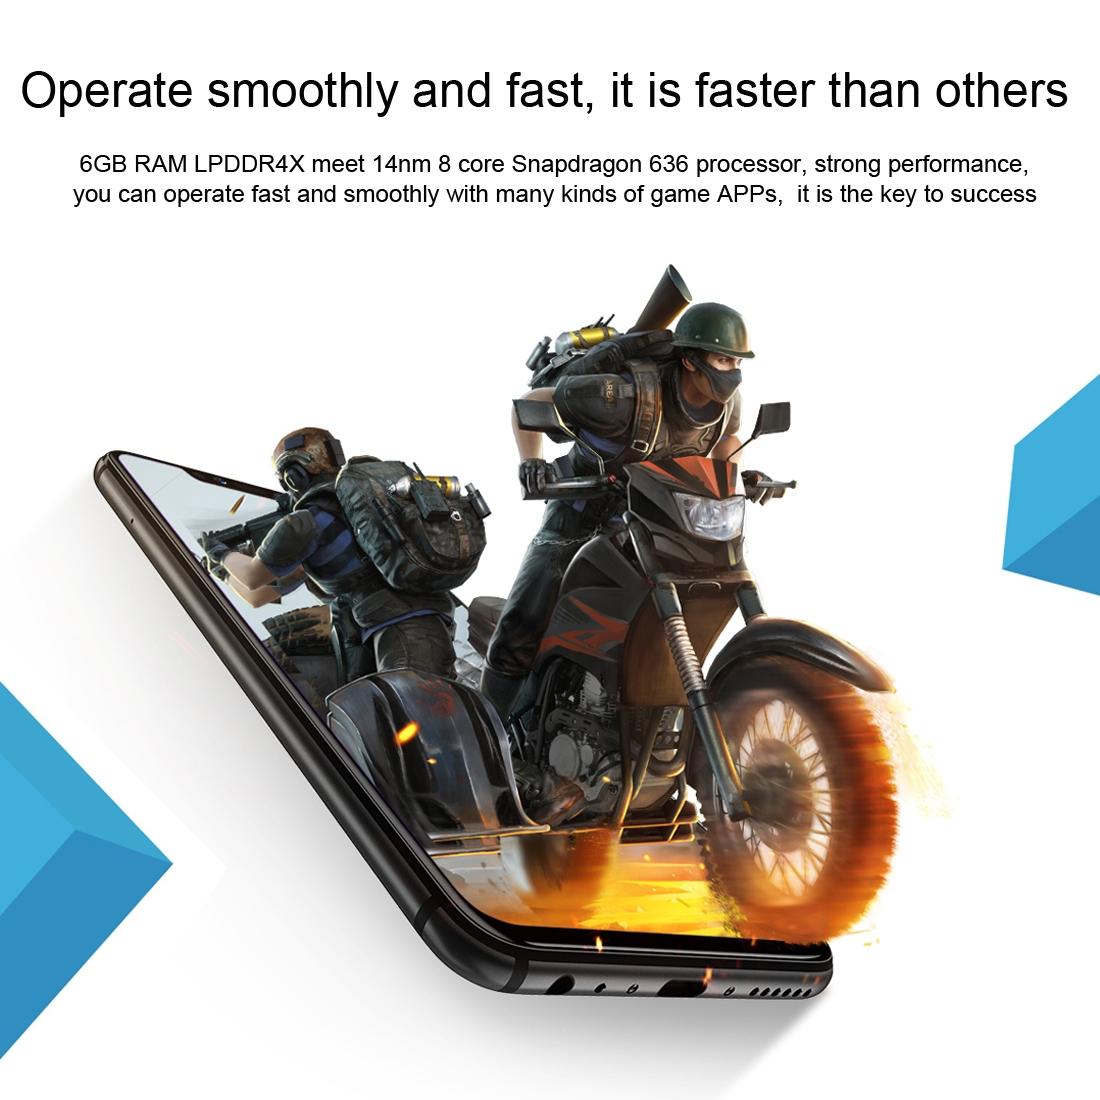 i.ibb.co/LxD8Fvv/Smartphone-Celular-6-GB-RAM-64-GB-ROM-Lenovo-S5-Pro-15.jpg